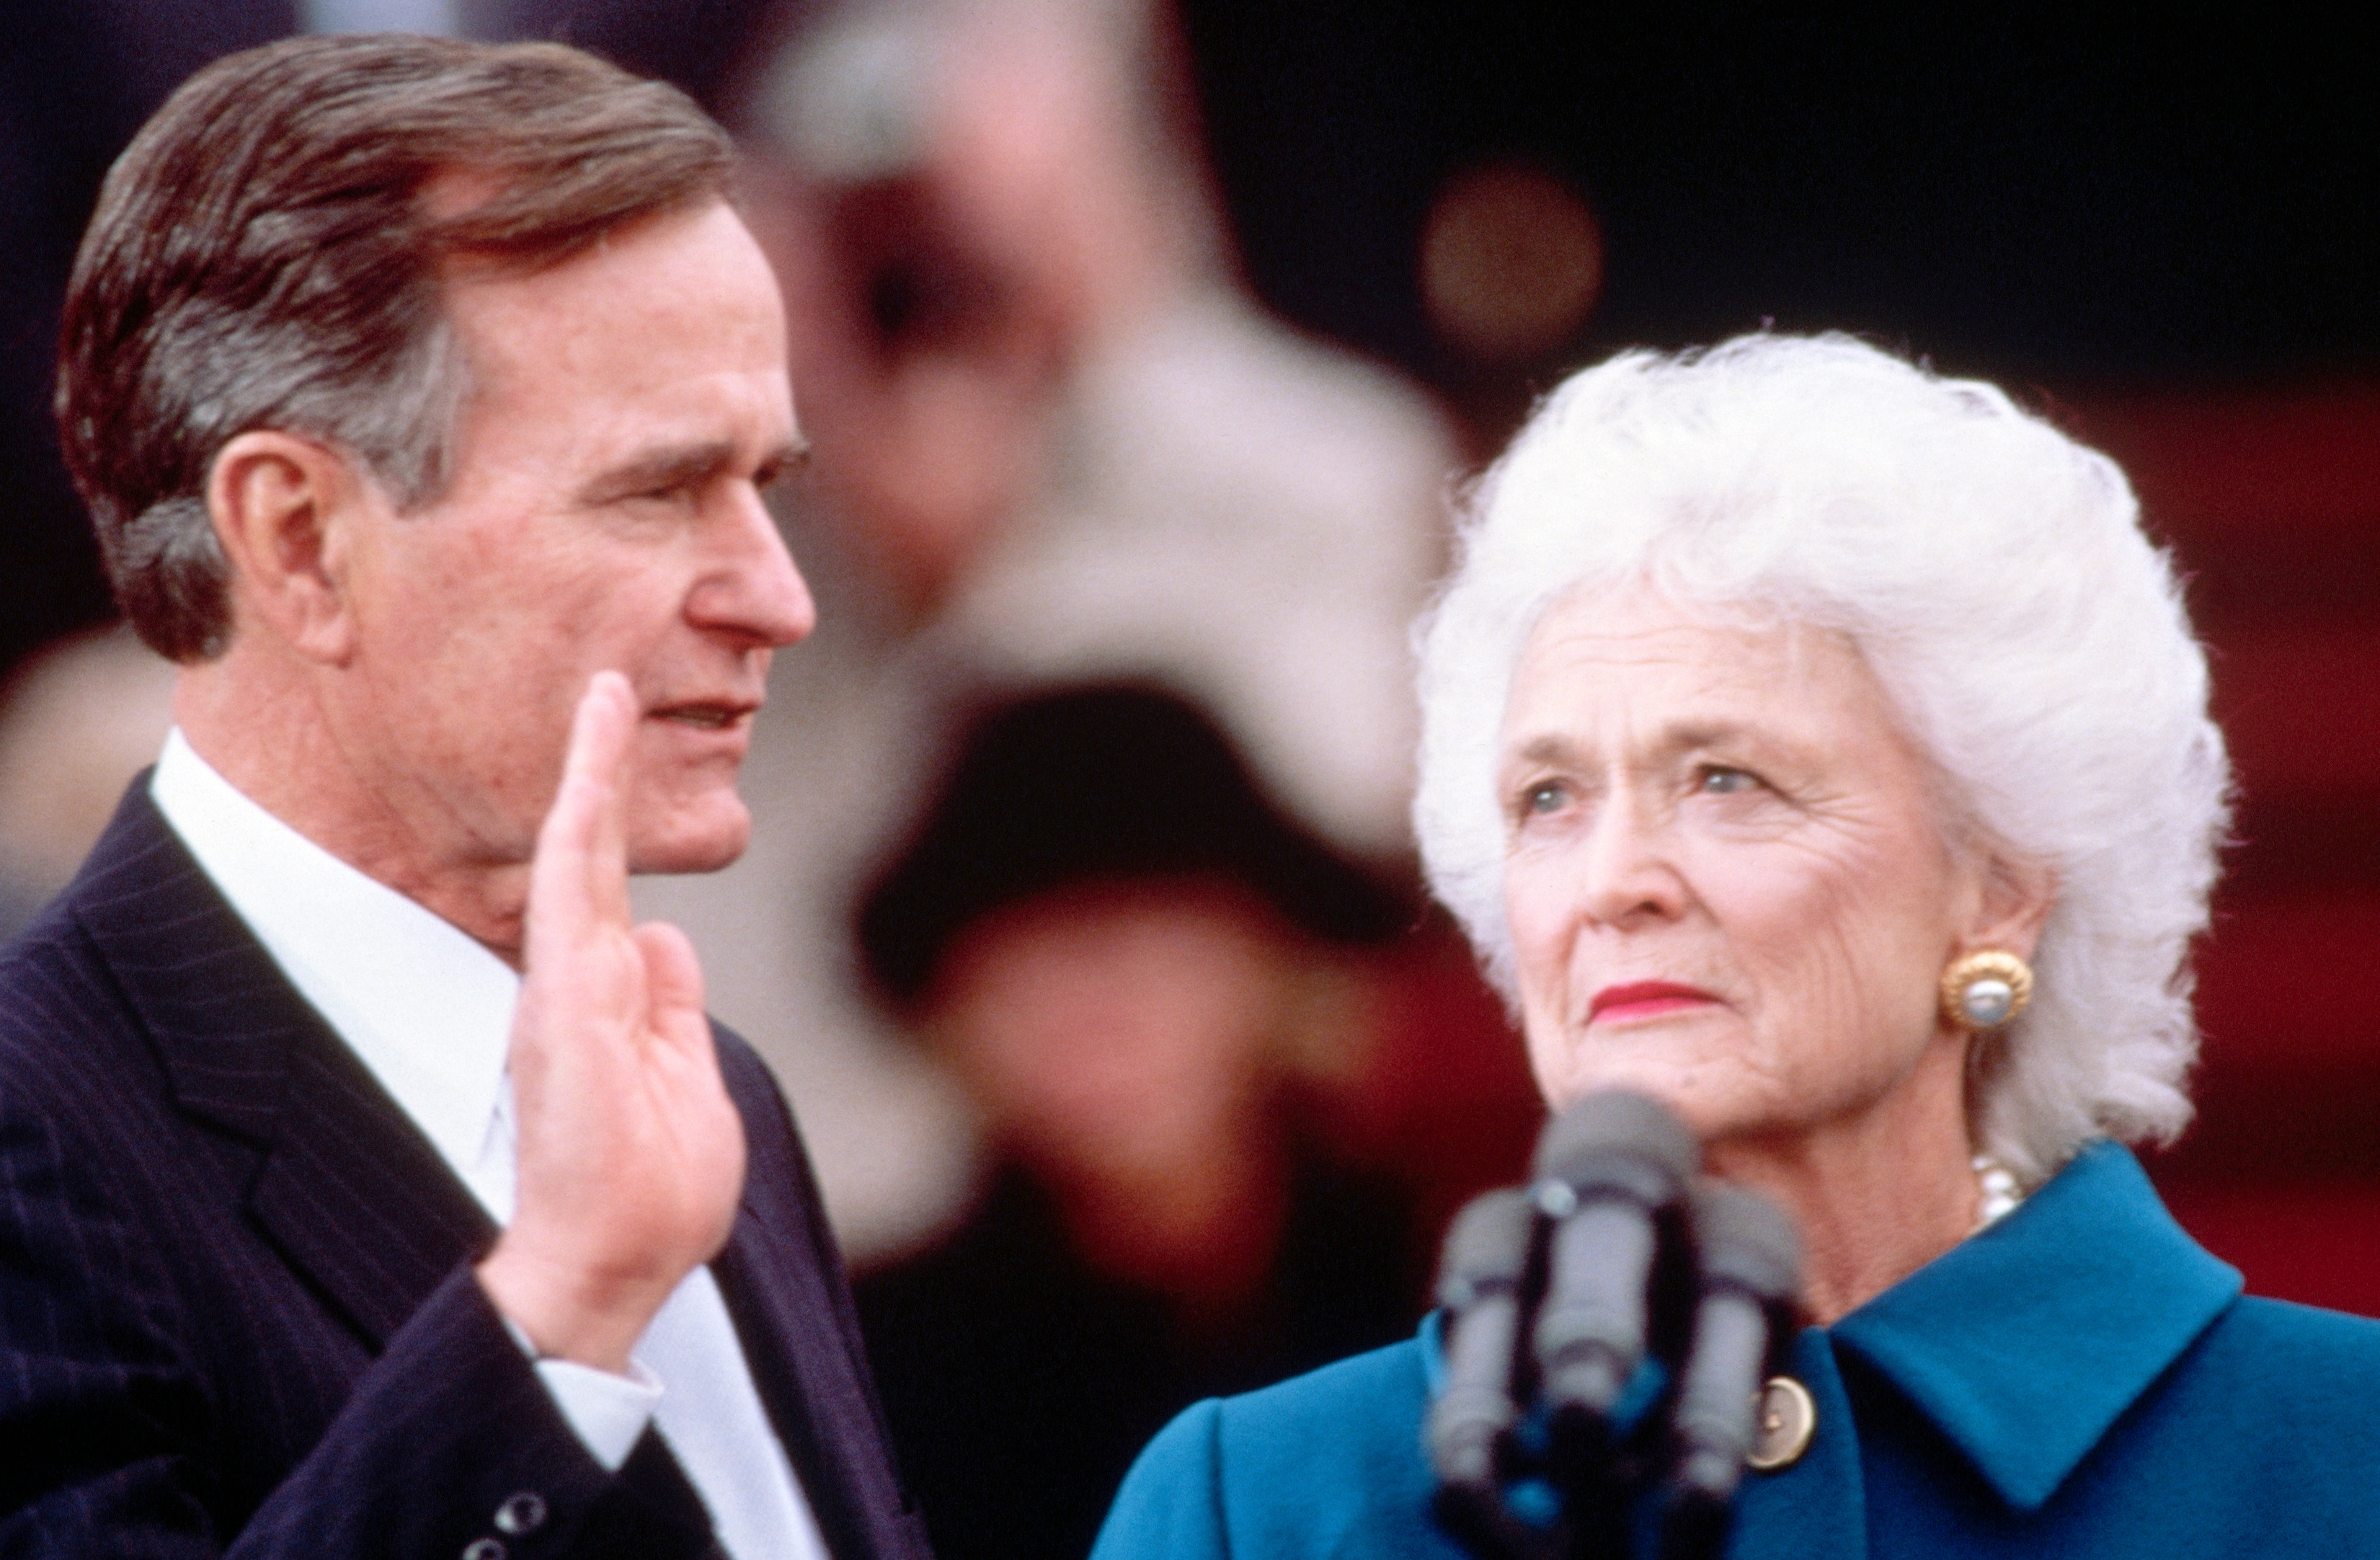 George H.W. Bush with hand raised and Barbara Bush next to him (© Wally McNamee/CORBIS/Corbis via Getty Images)